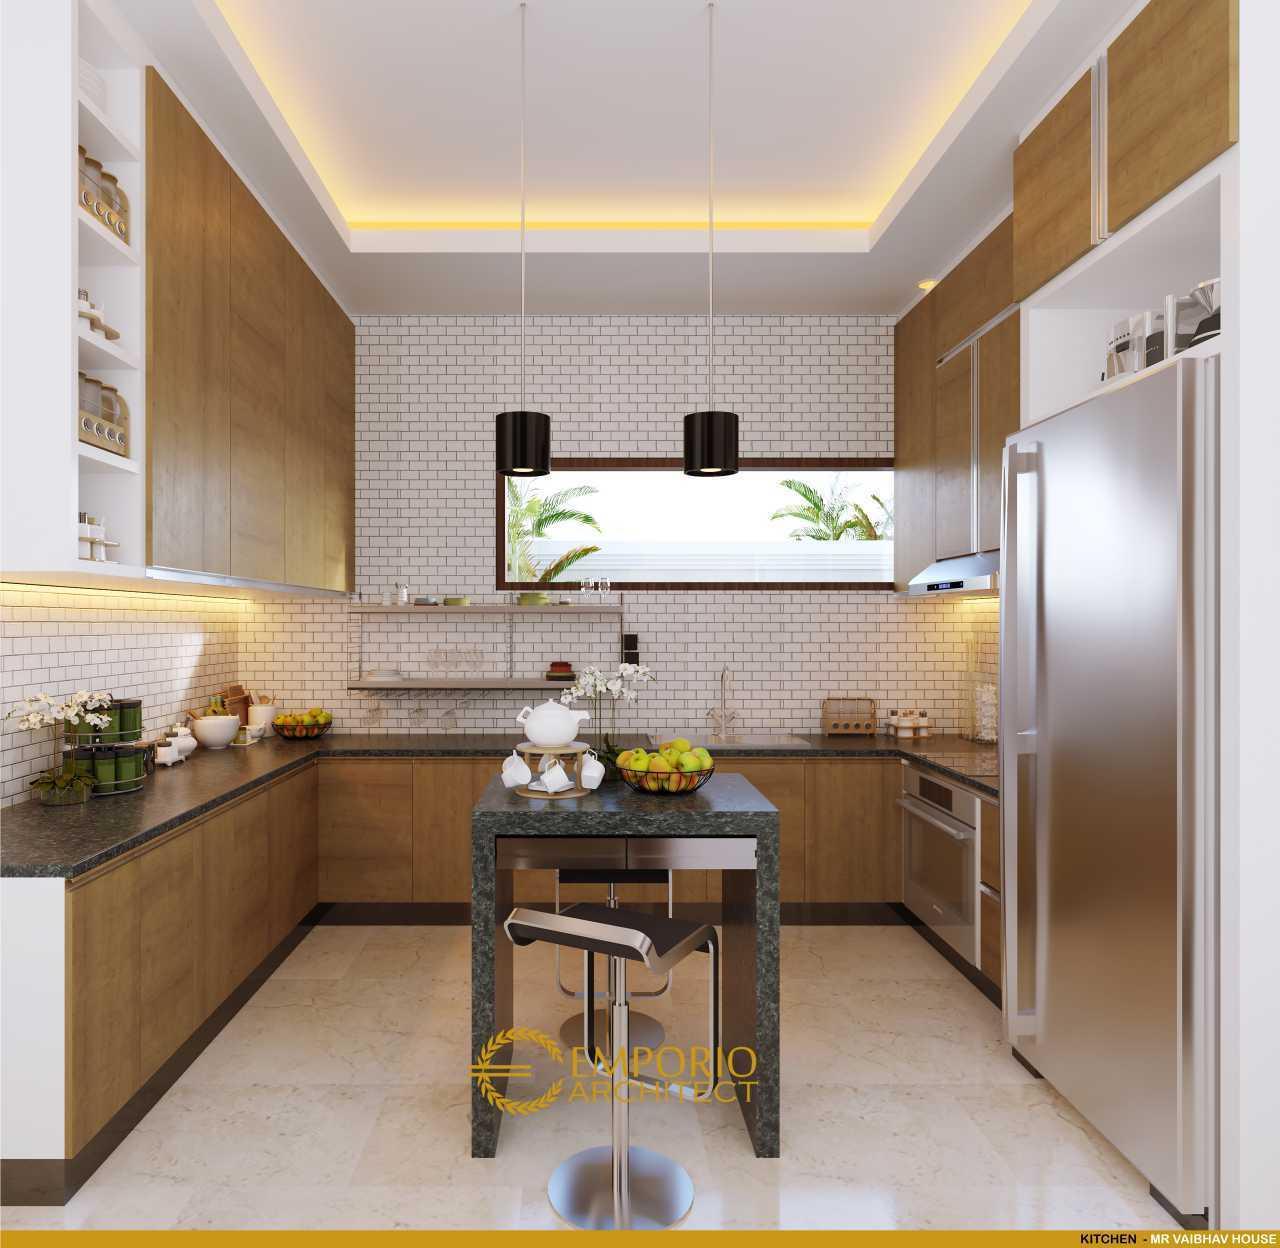 Emporio Architect Jasa Arsitek India Desain Rumah Villa Bali 2 Lantai 724 @ India India India Emporio-Architect-Jasa-Arsitek-India-Desain-Rumah-Villa-Bali-2-Lantai-724-India   93944